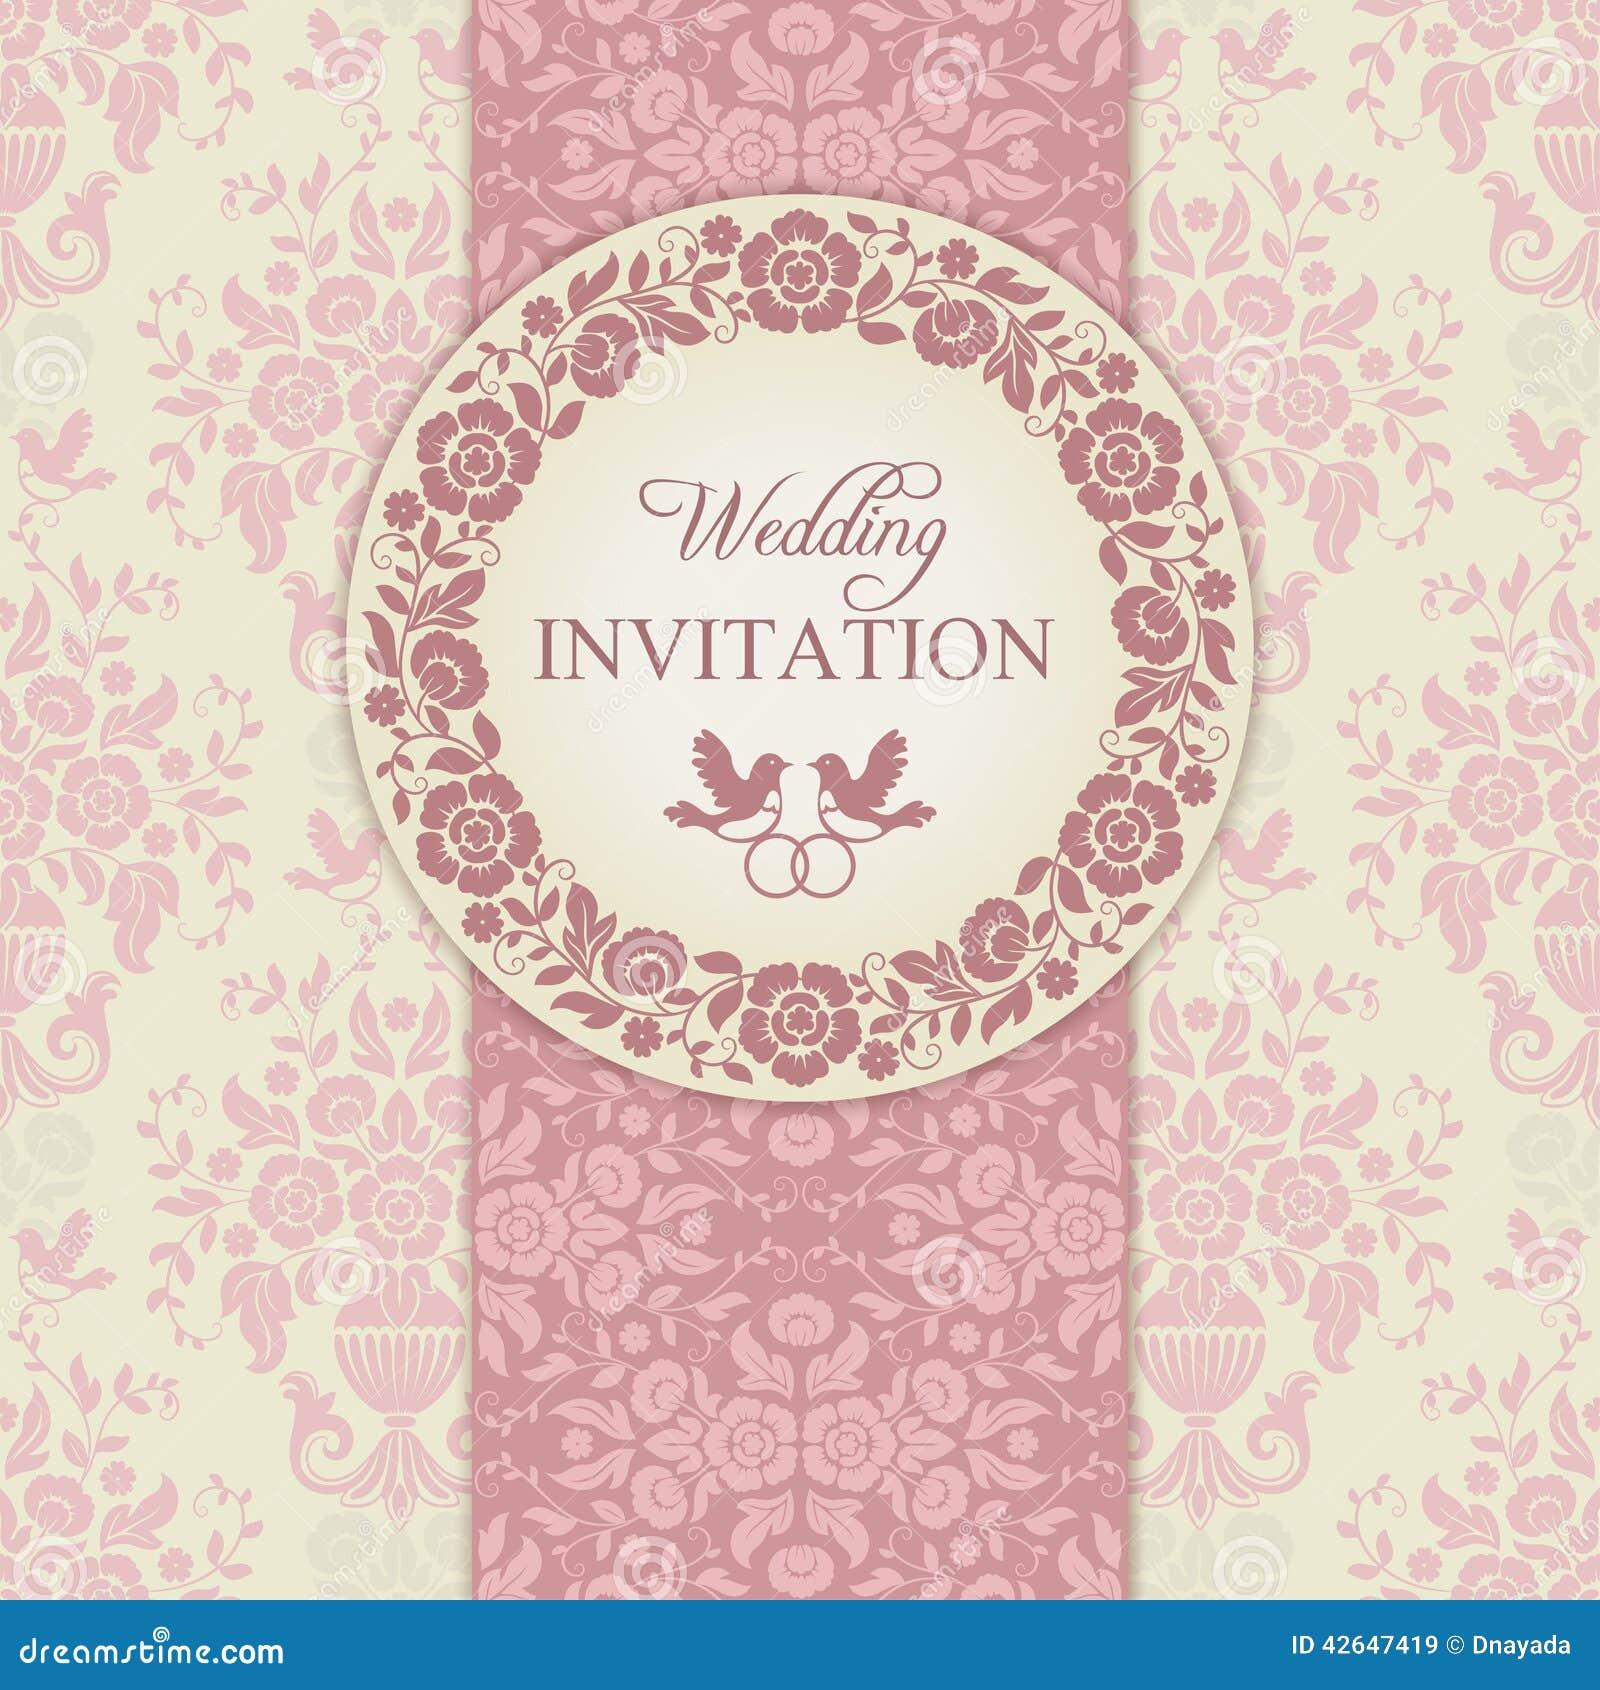 Birds Wedding Invitations with amazing invitation design